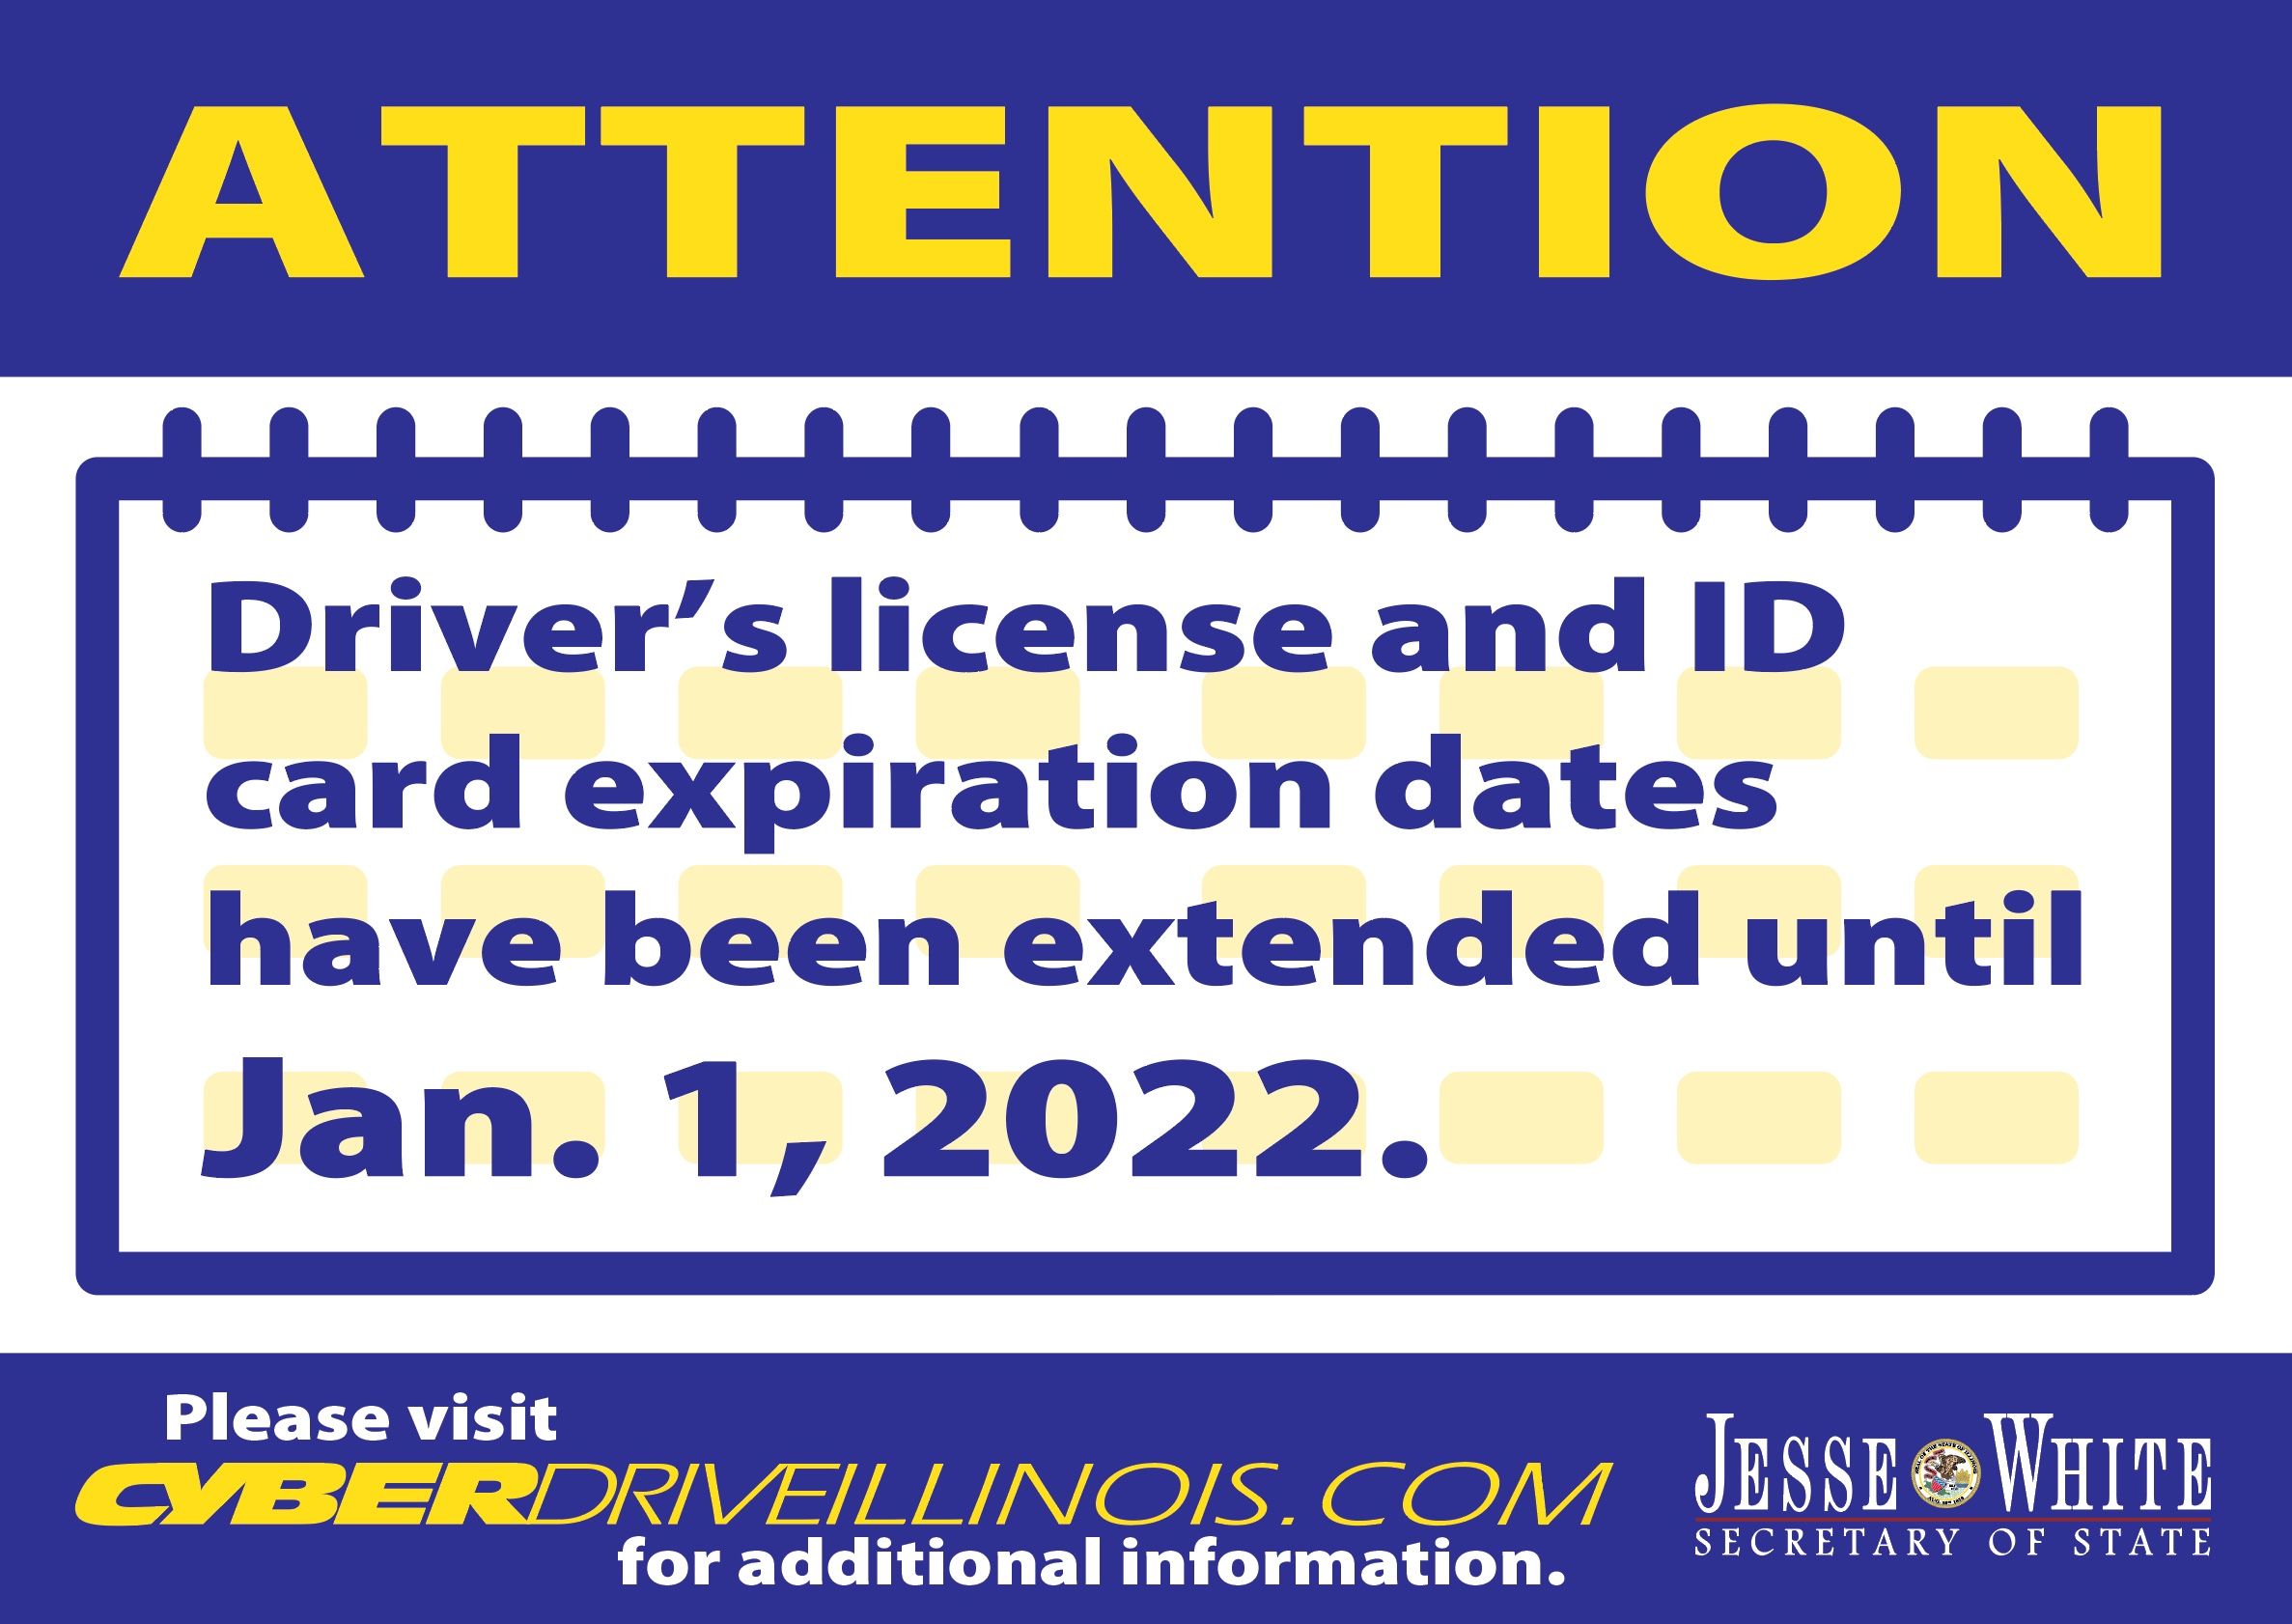 ID_CARD_LICENSE_EXTENSION_AD_2021_JPG.jpg